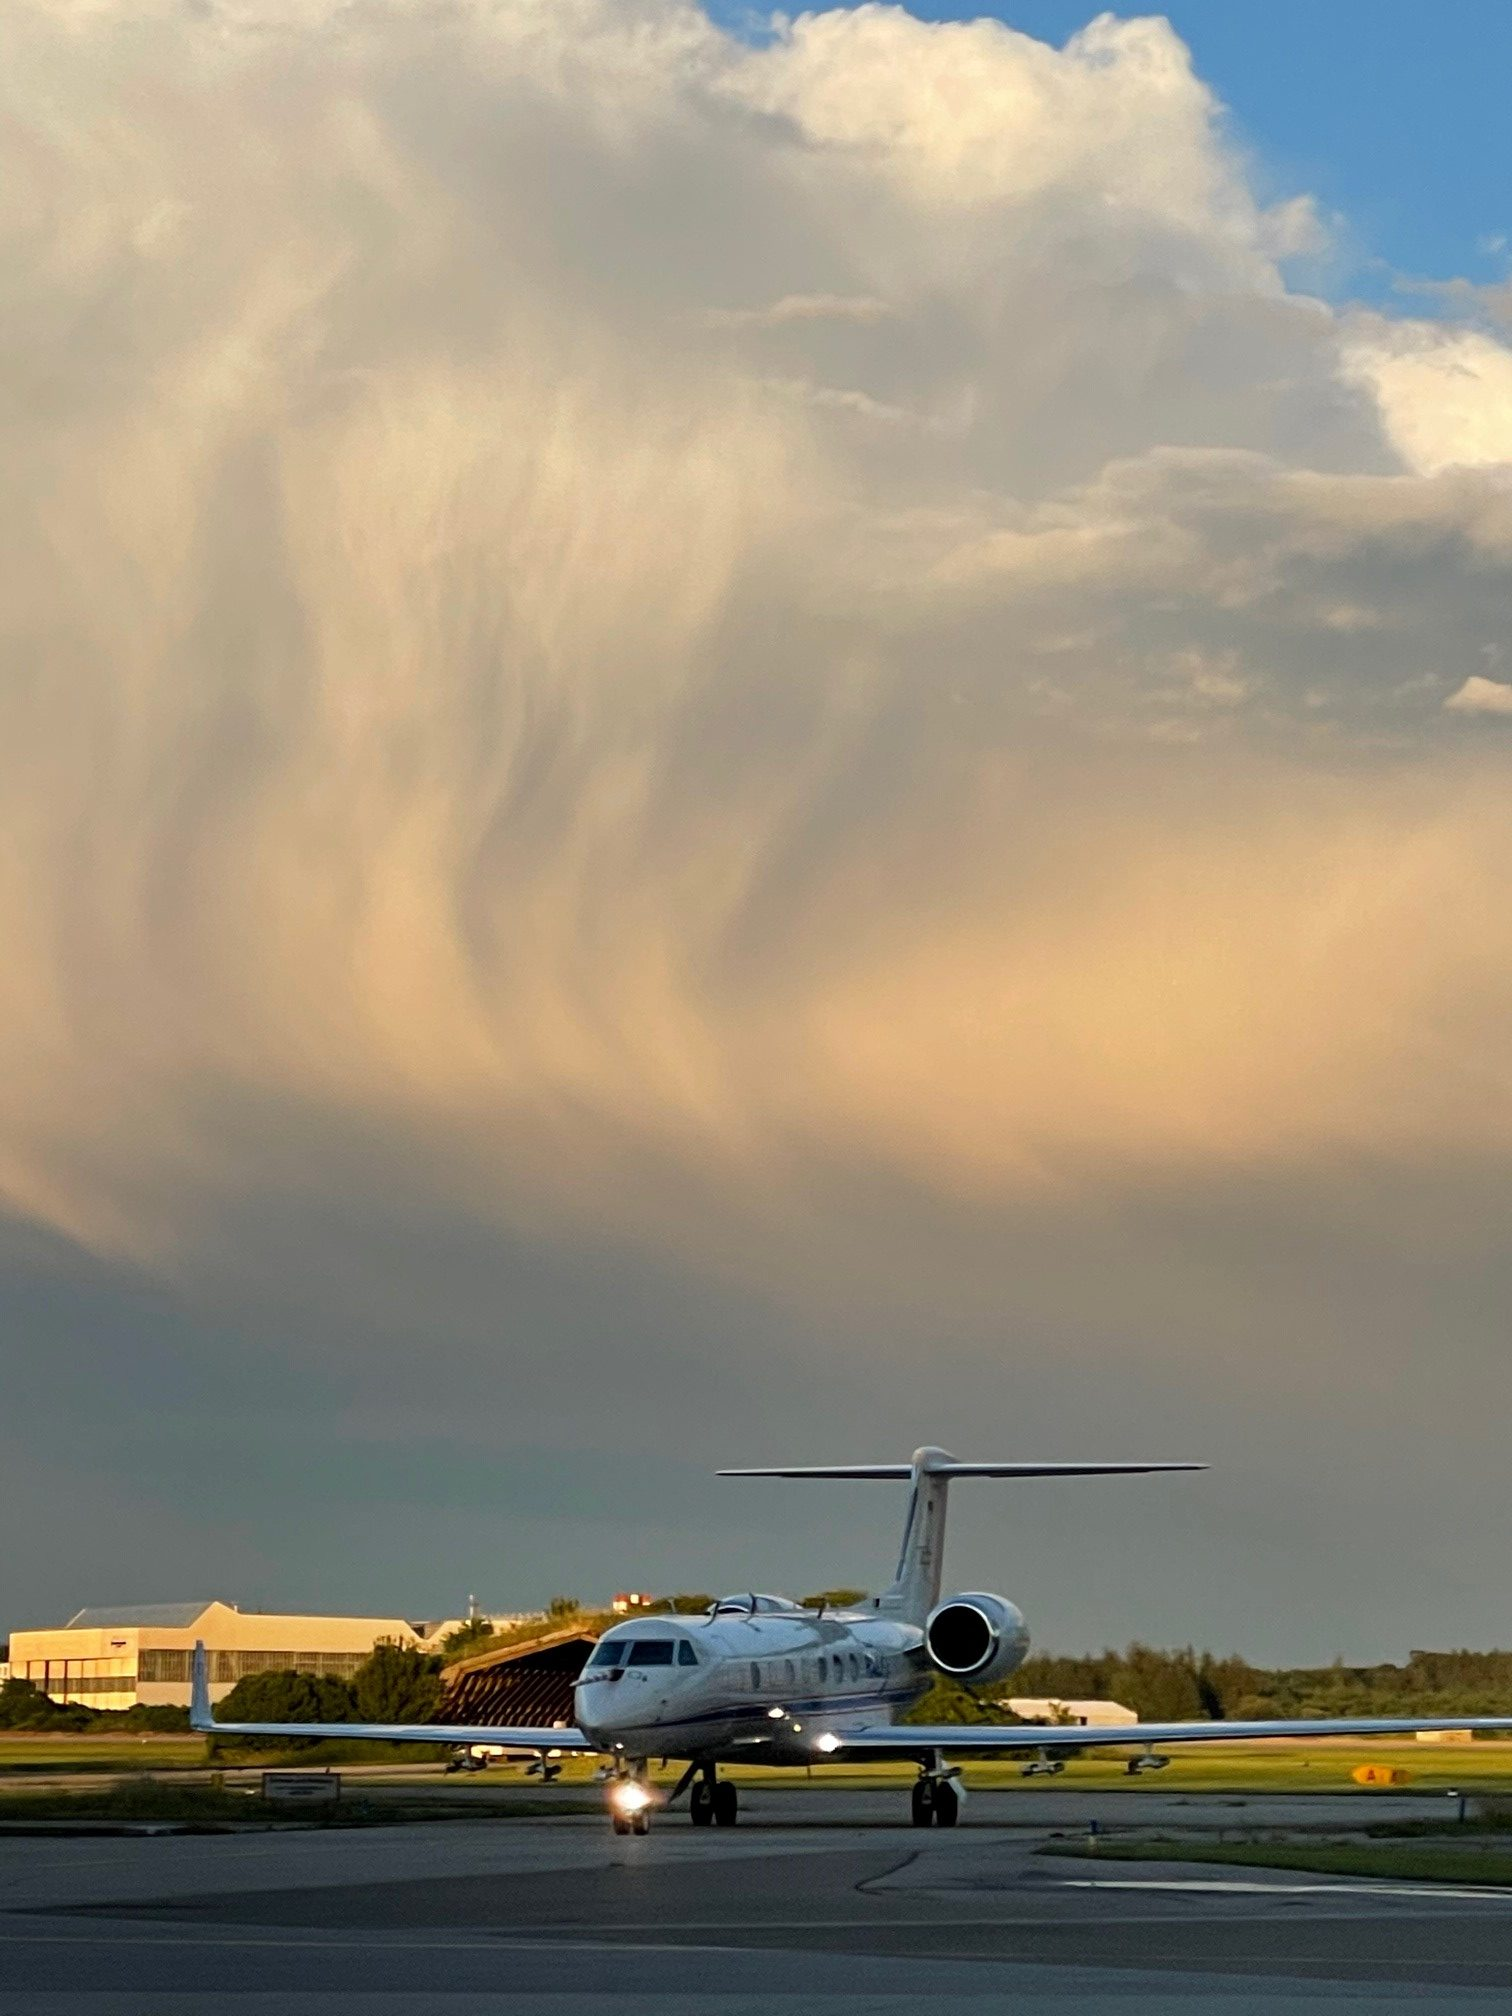 HALO with convective cirrus